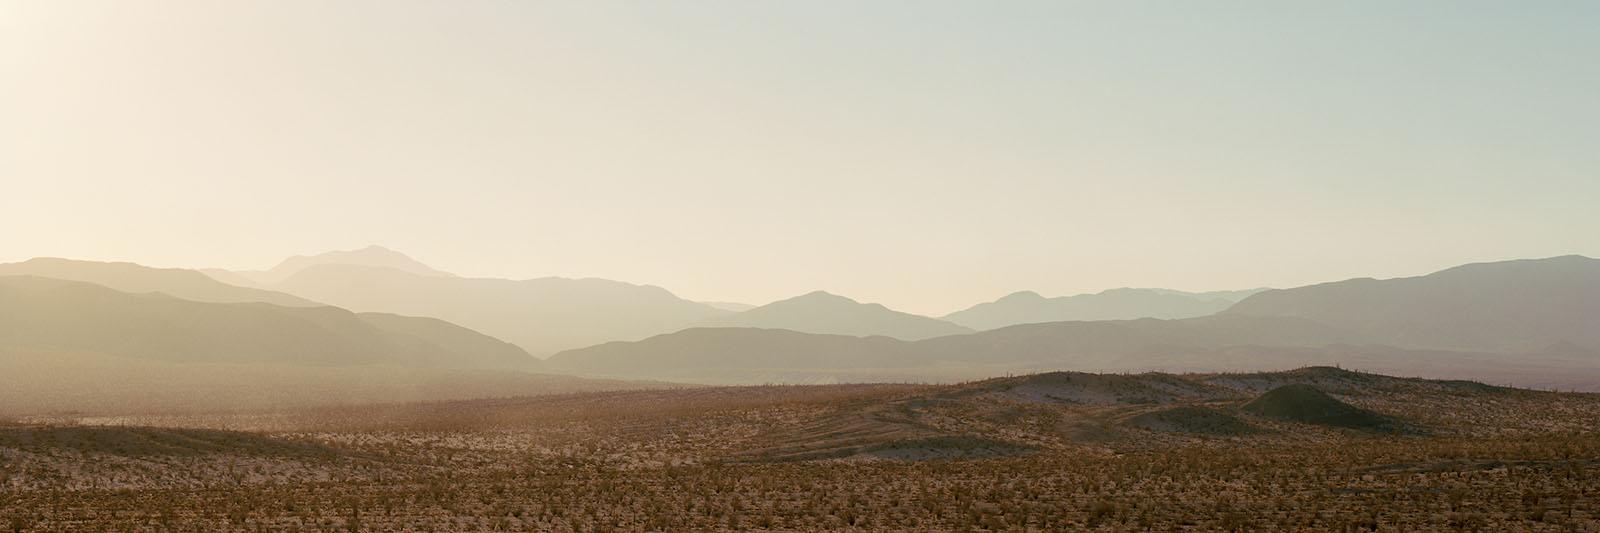 Anza-Borrego Desert, Anza-Borrego Desert State Park, California, Colorado Desert, Desert, Horizontal, Imperial County, Kodak Portra 160, Landscape, Landscapes, Mountains, Nature, Outdoors, Panorama, P, photo